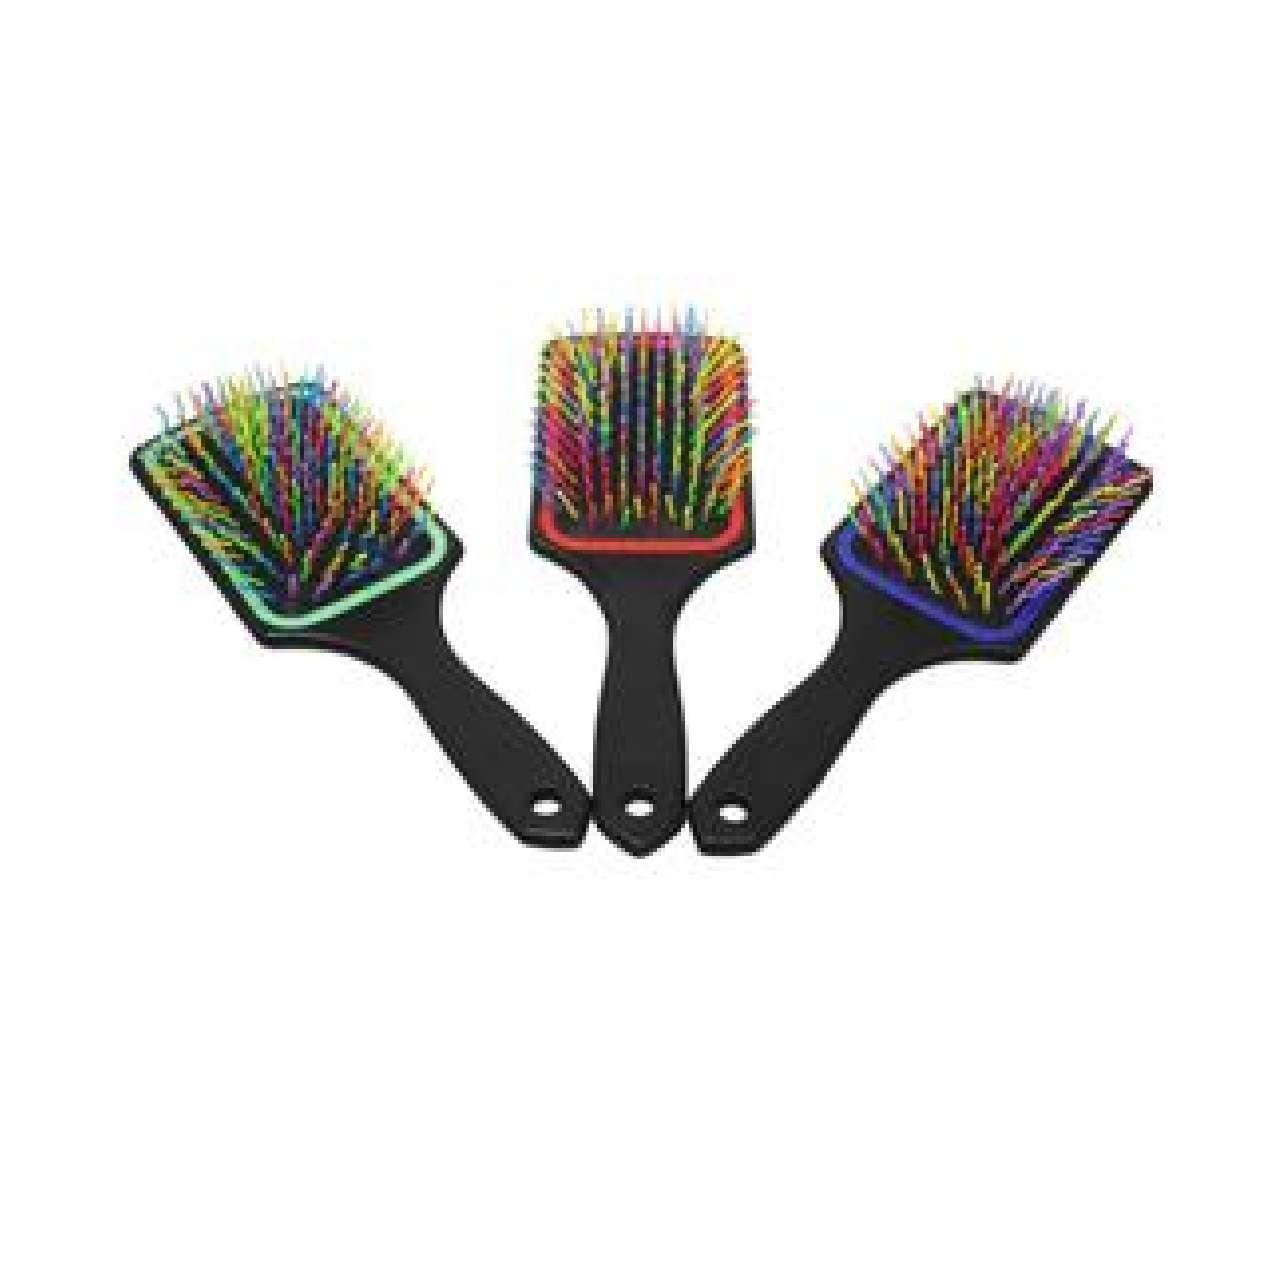 1 Frizzly Hair Brush Mens Ladies Tangle Free Multicoloured Hair Brush 24cm x 8cm